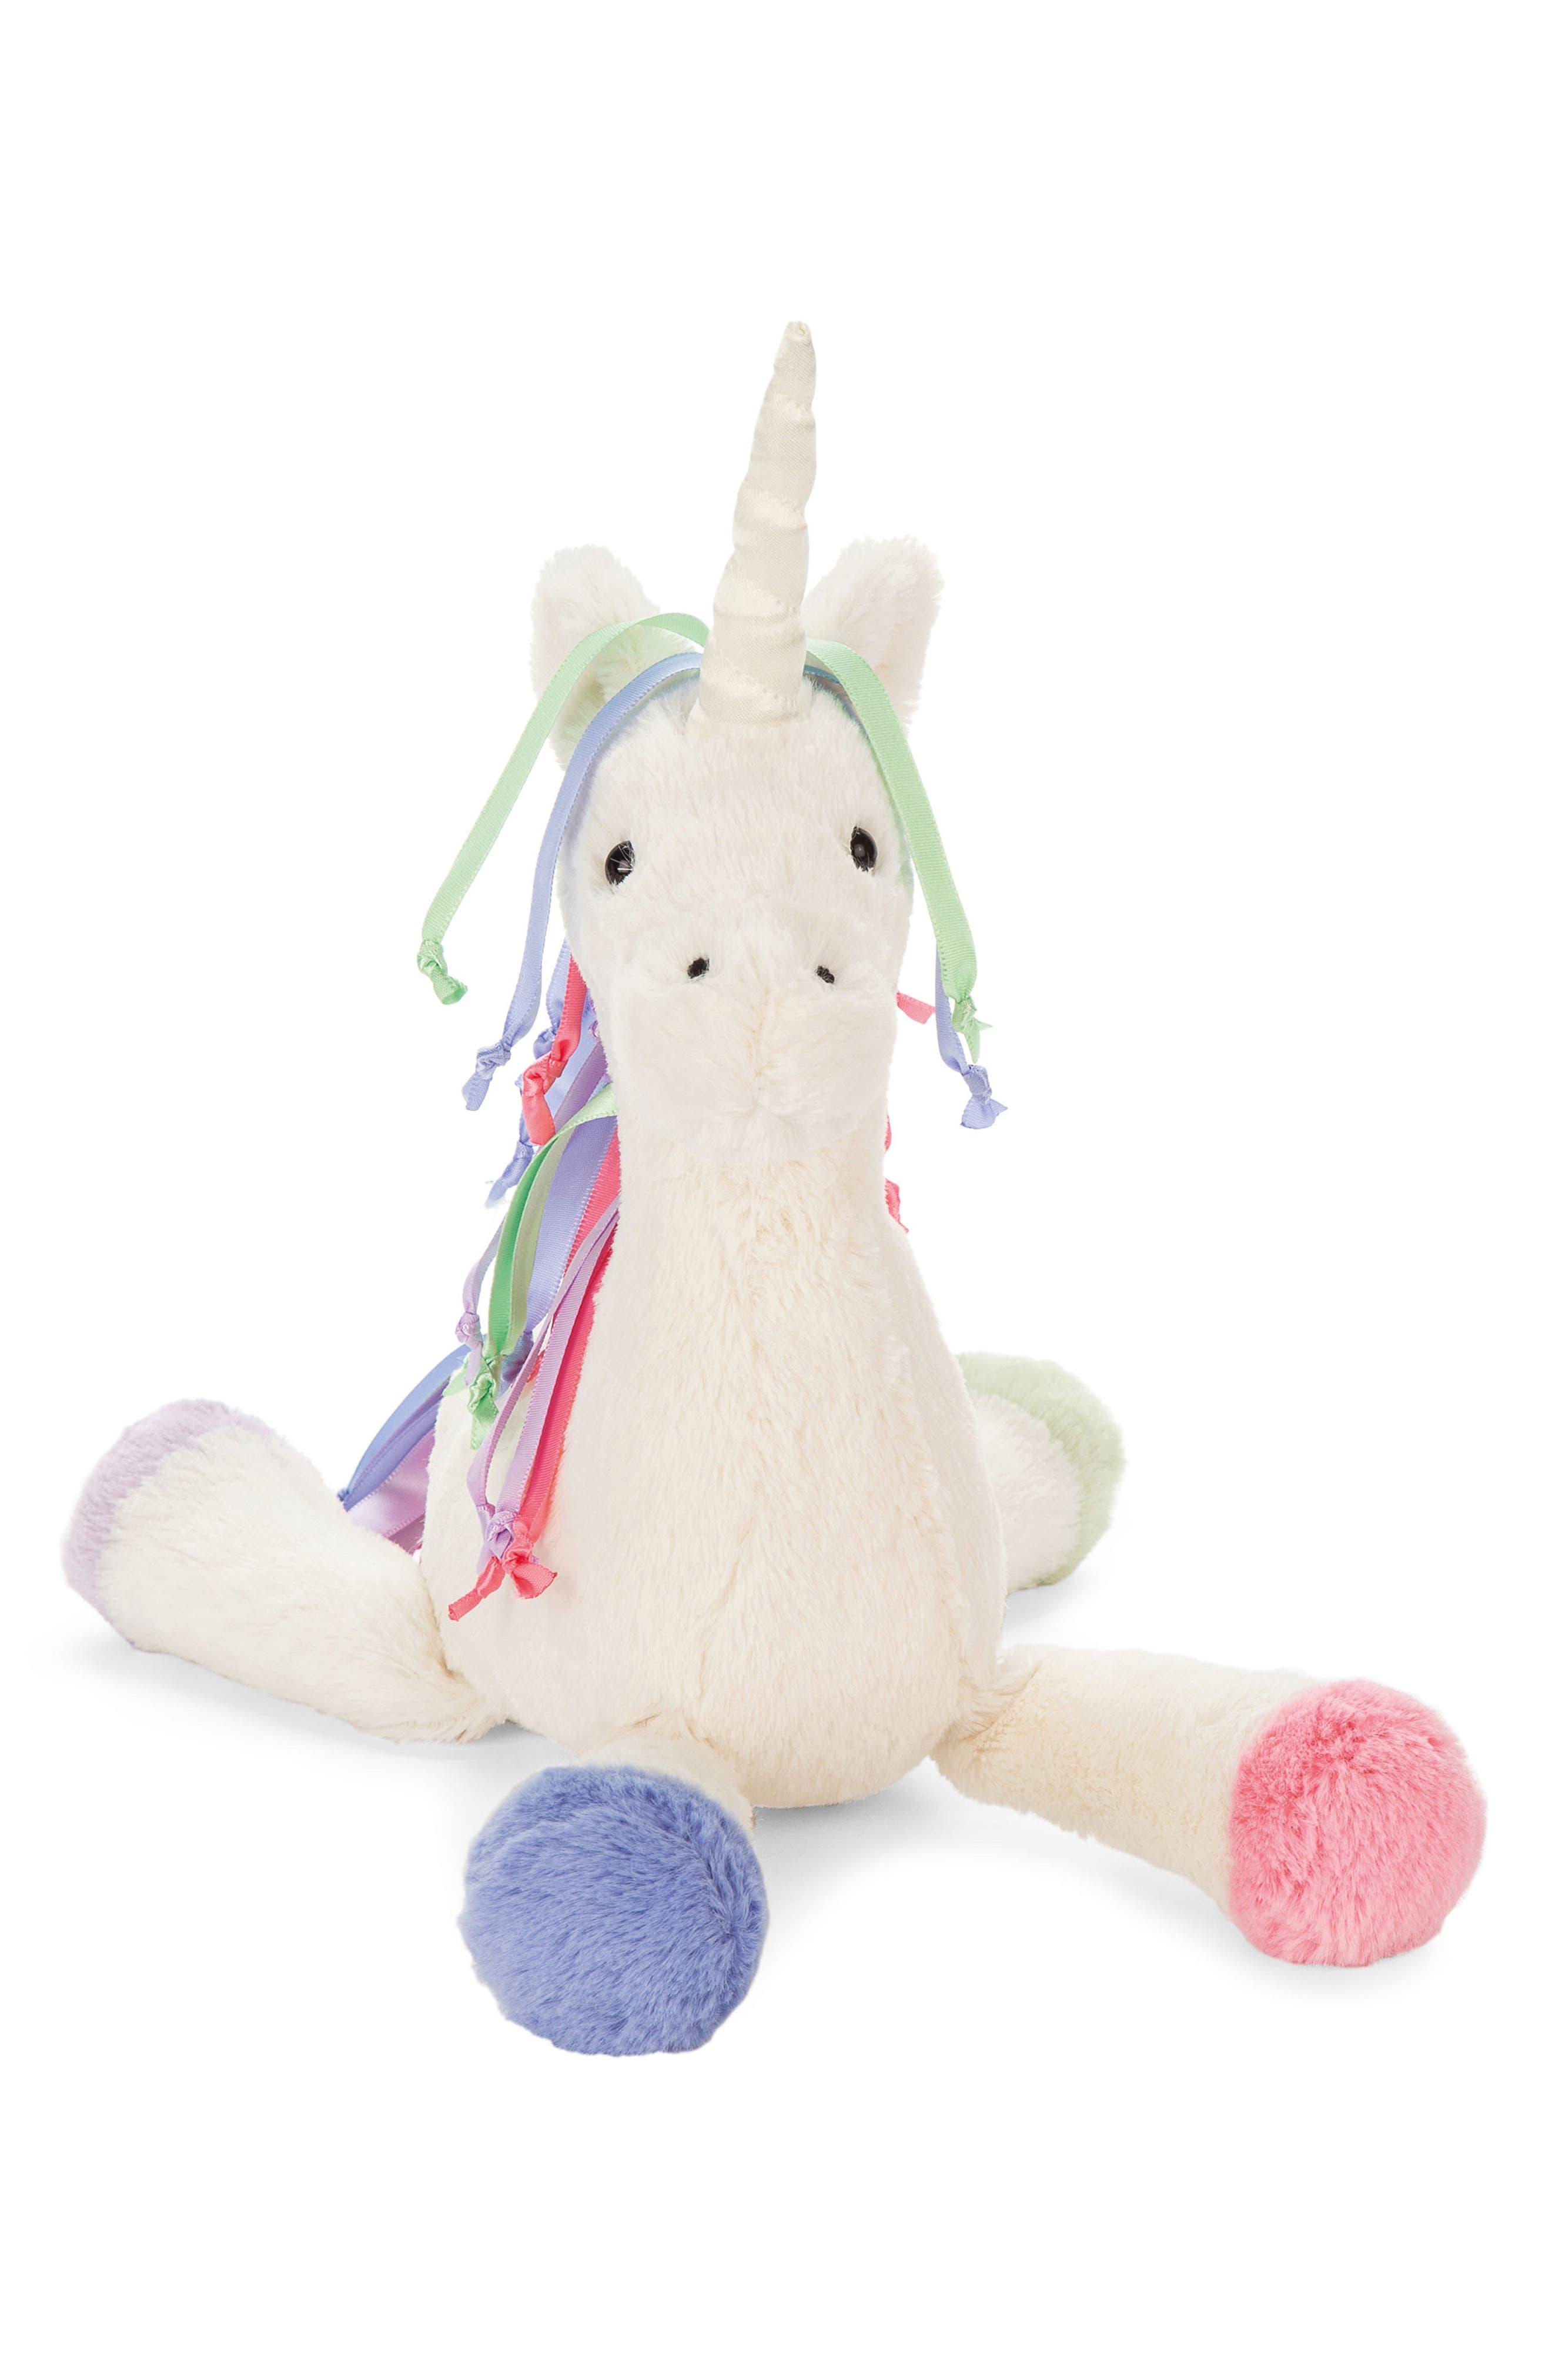 Lollopylou Unicorn Chime Stuffed Animal,                         Main,                         color, Cream